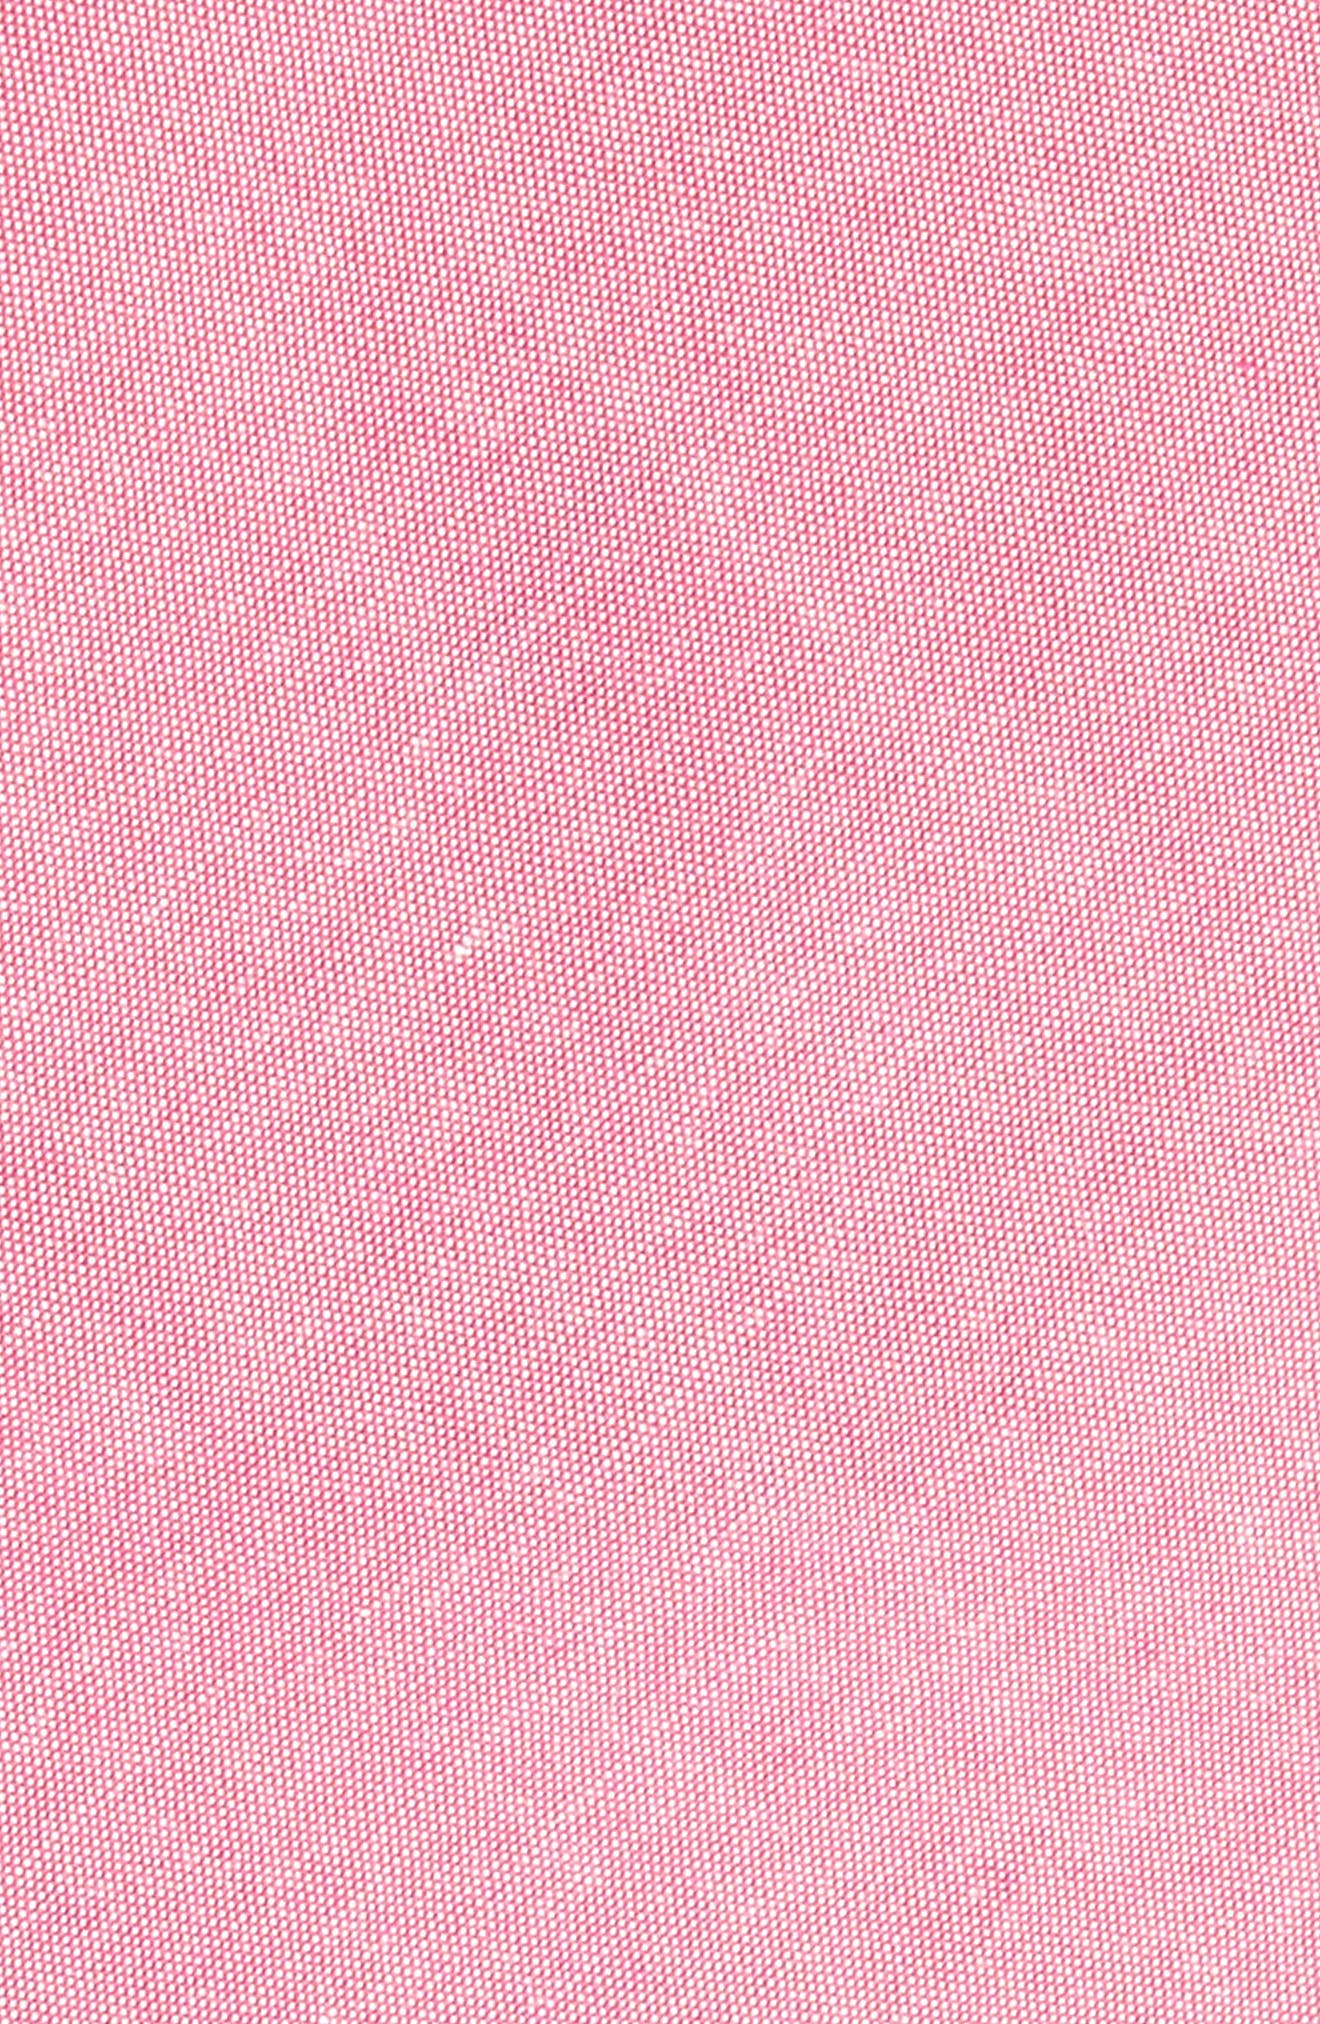 Desmond Solid Cotton Skinny Tie,                             Alternate thumbnail 2, color,                             Rose